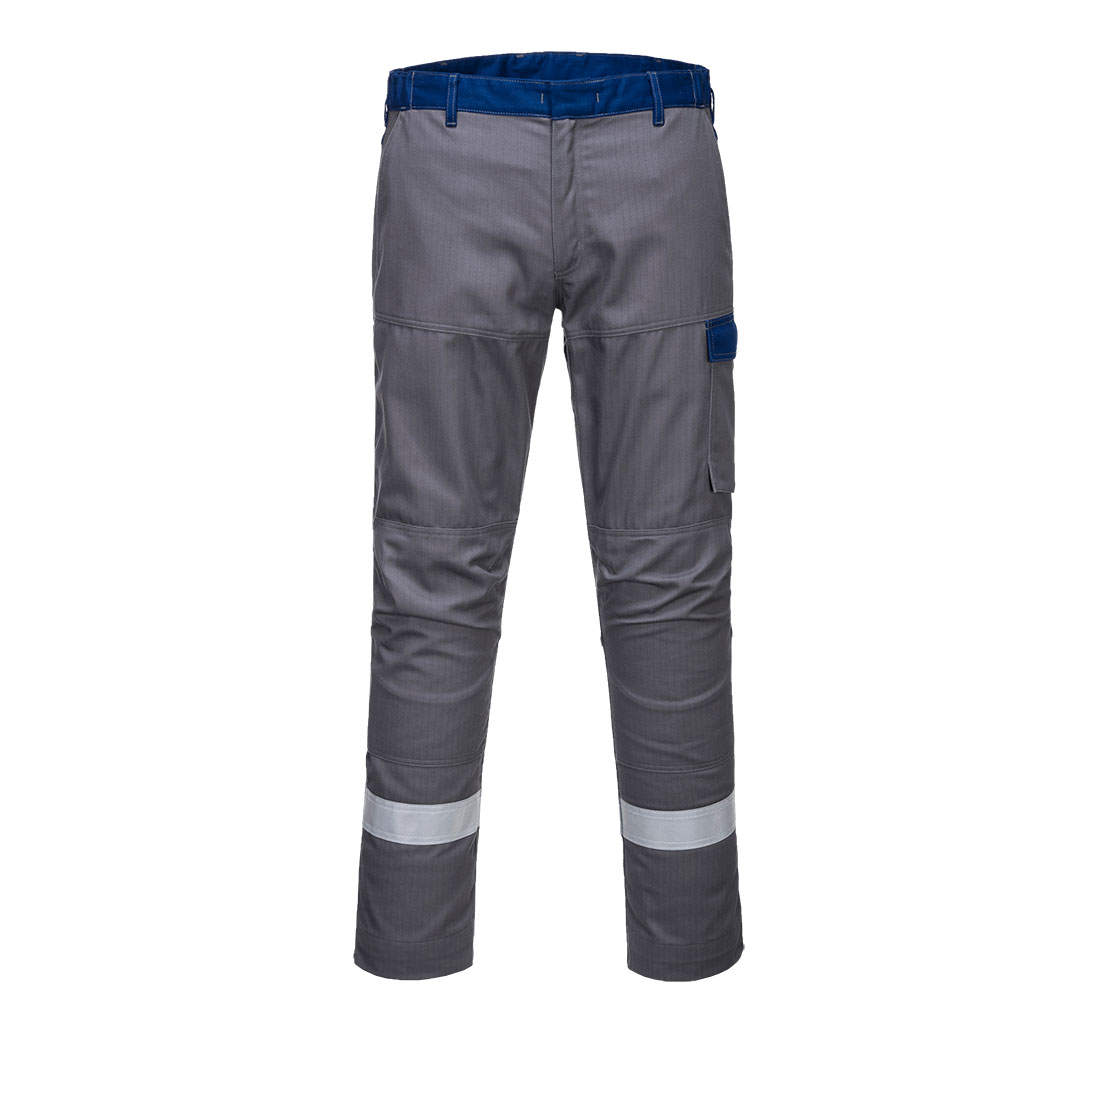 Portwest Bizflame Two-Tone Trouser - Grey